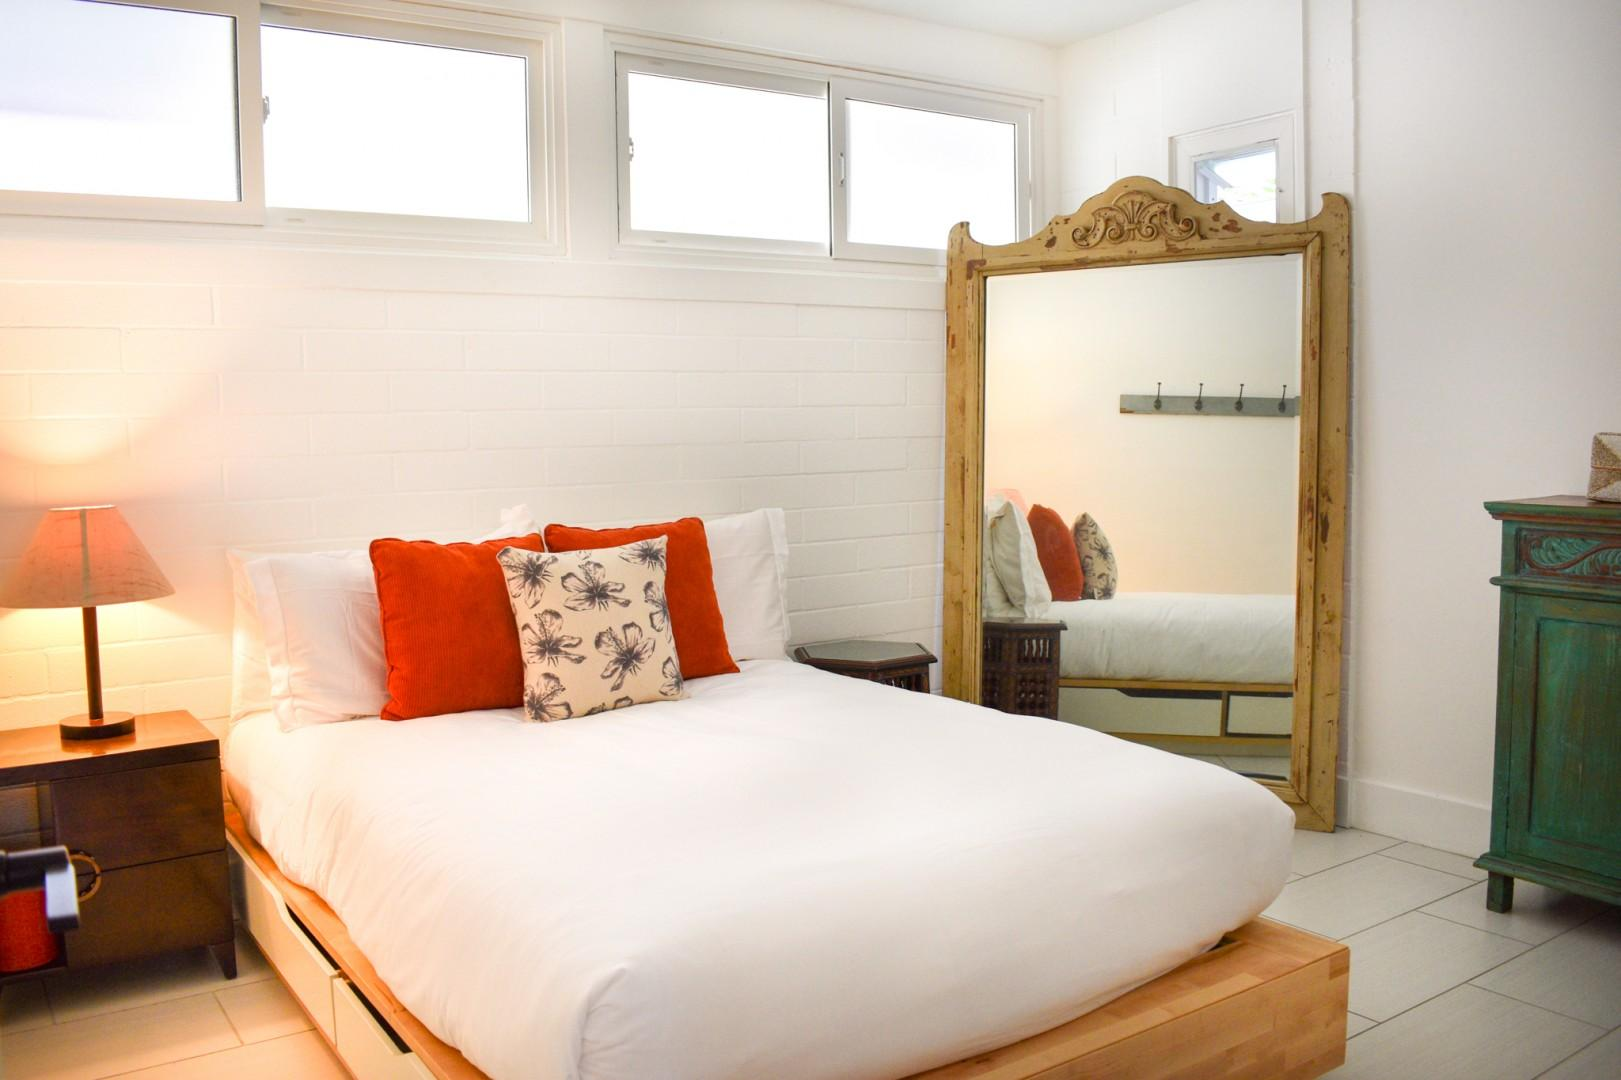 Main house bedroom 3, full bed